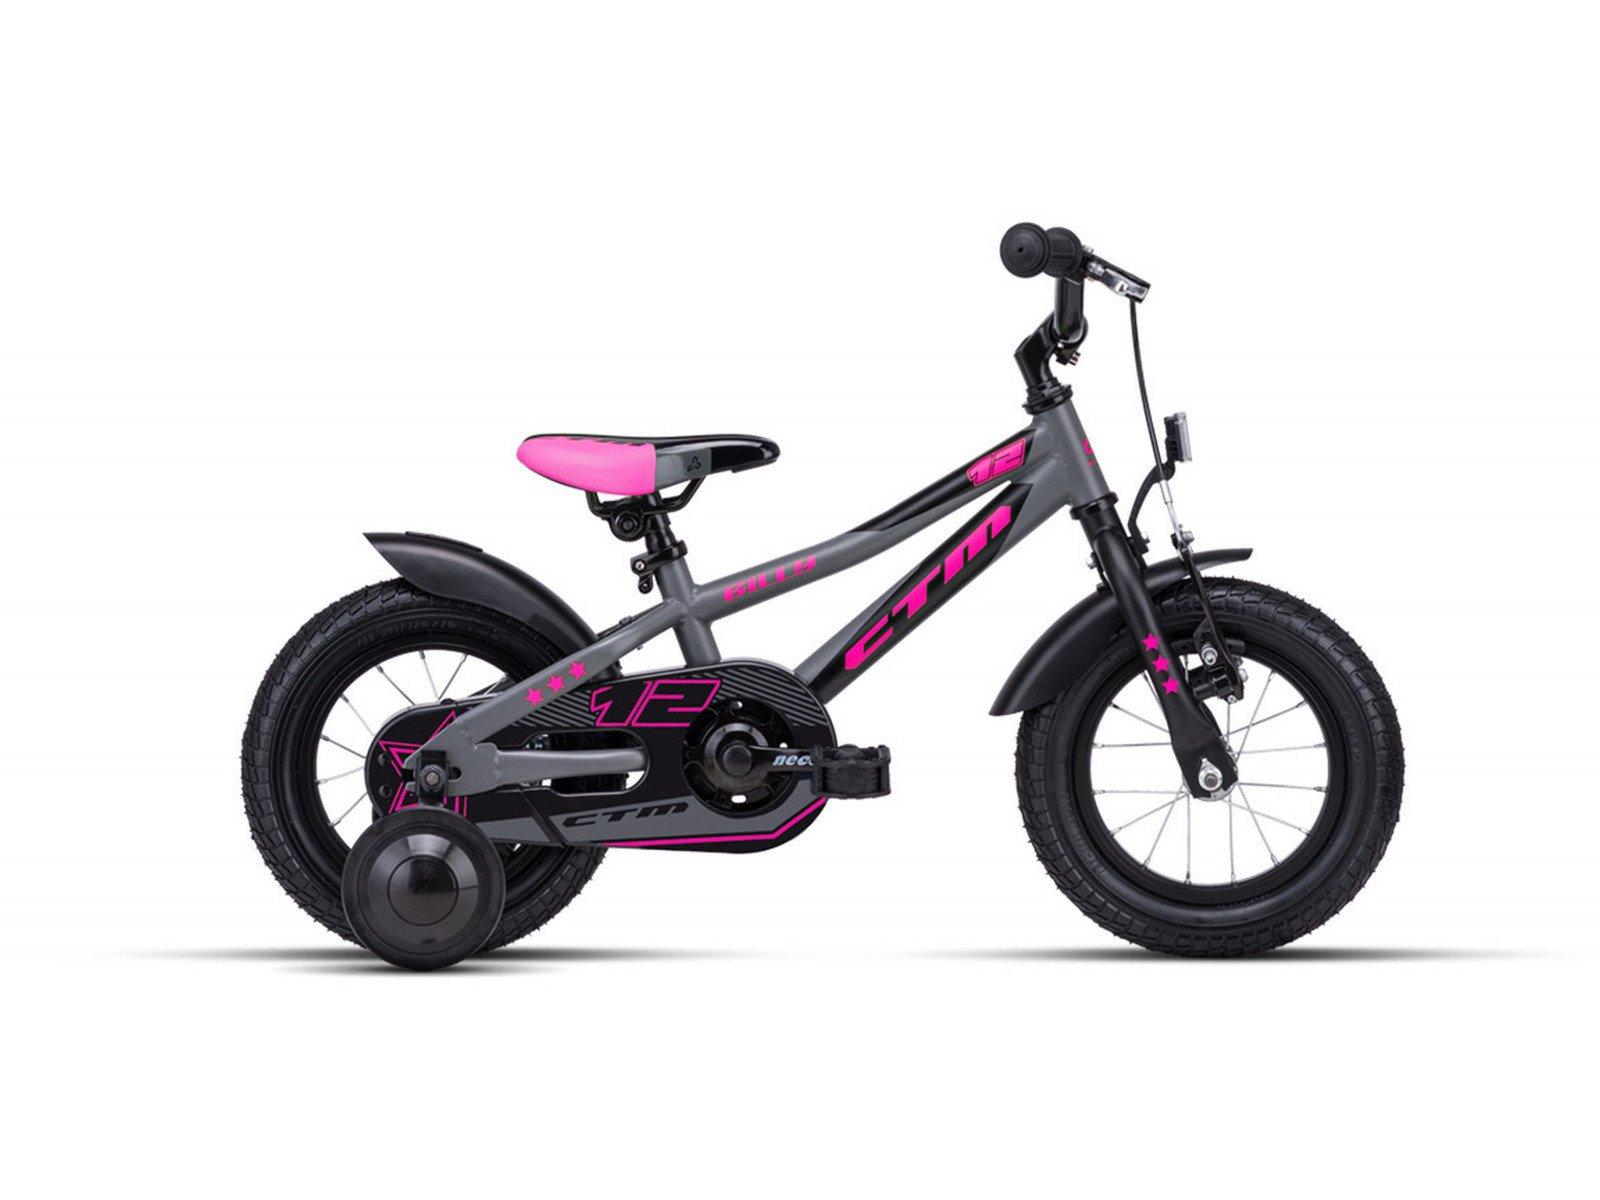 Bērnu divritenis velosipēds CTM Billy 12 collas 42.001